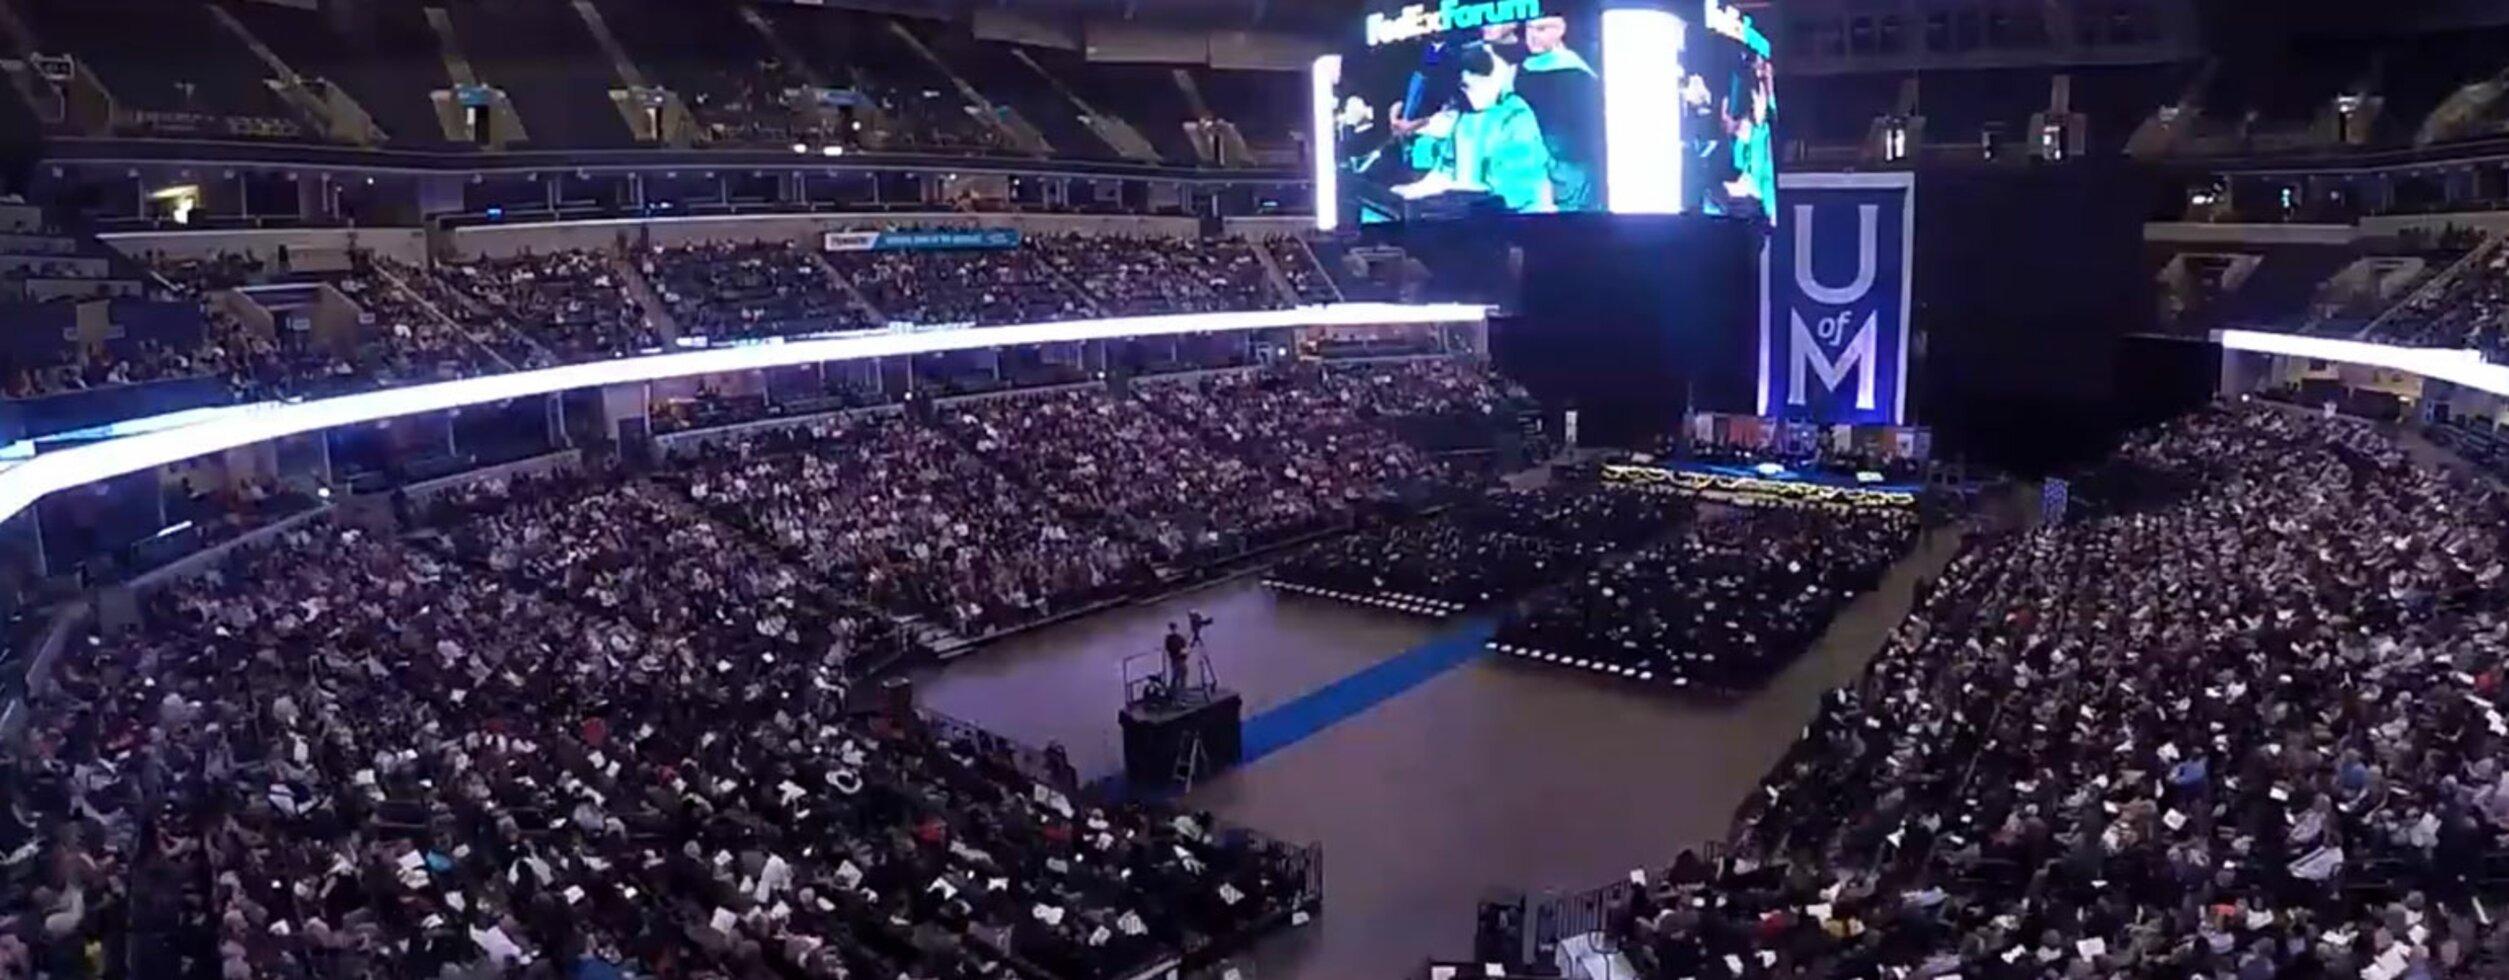 University of Memphis Graduation